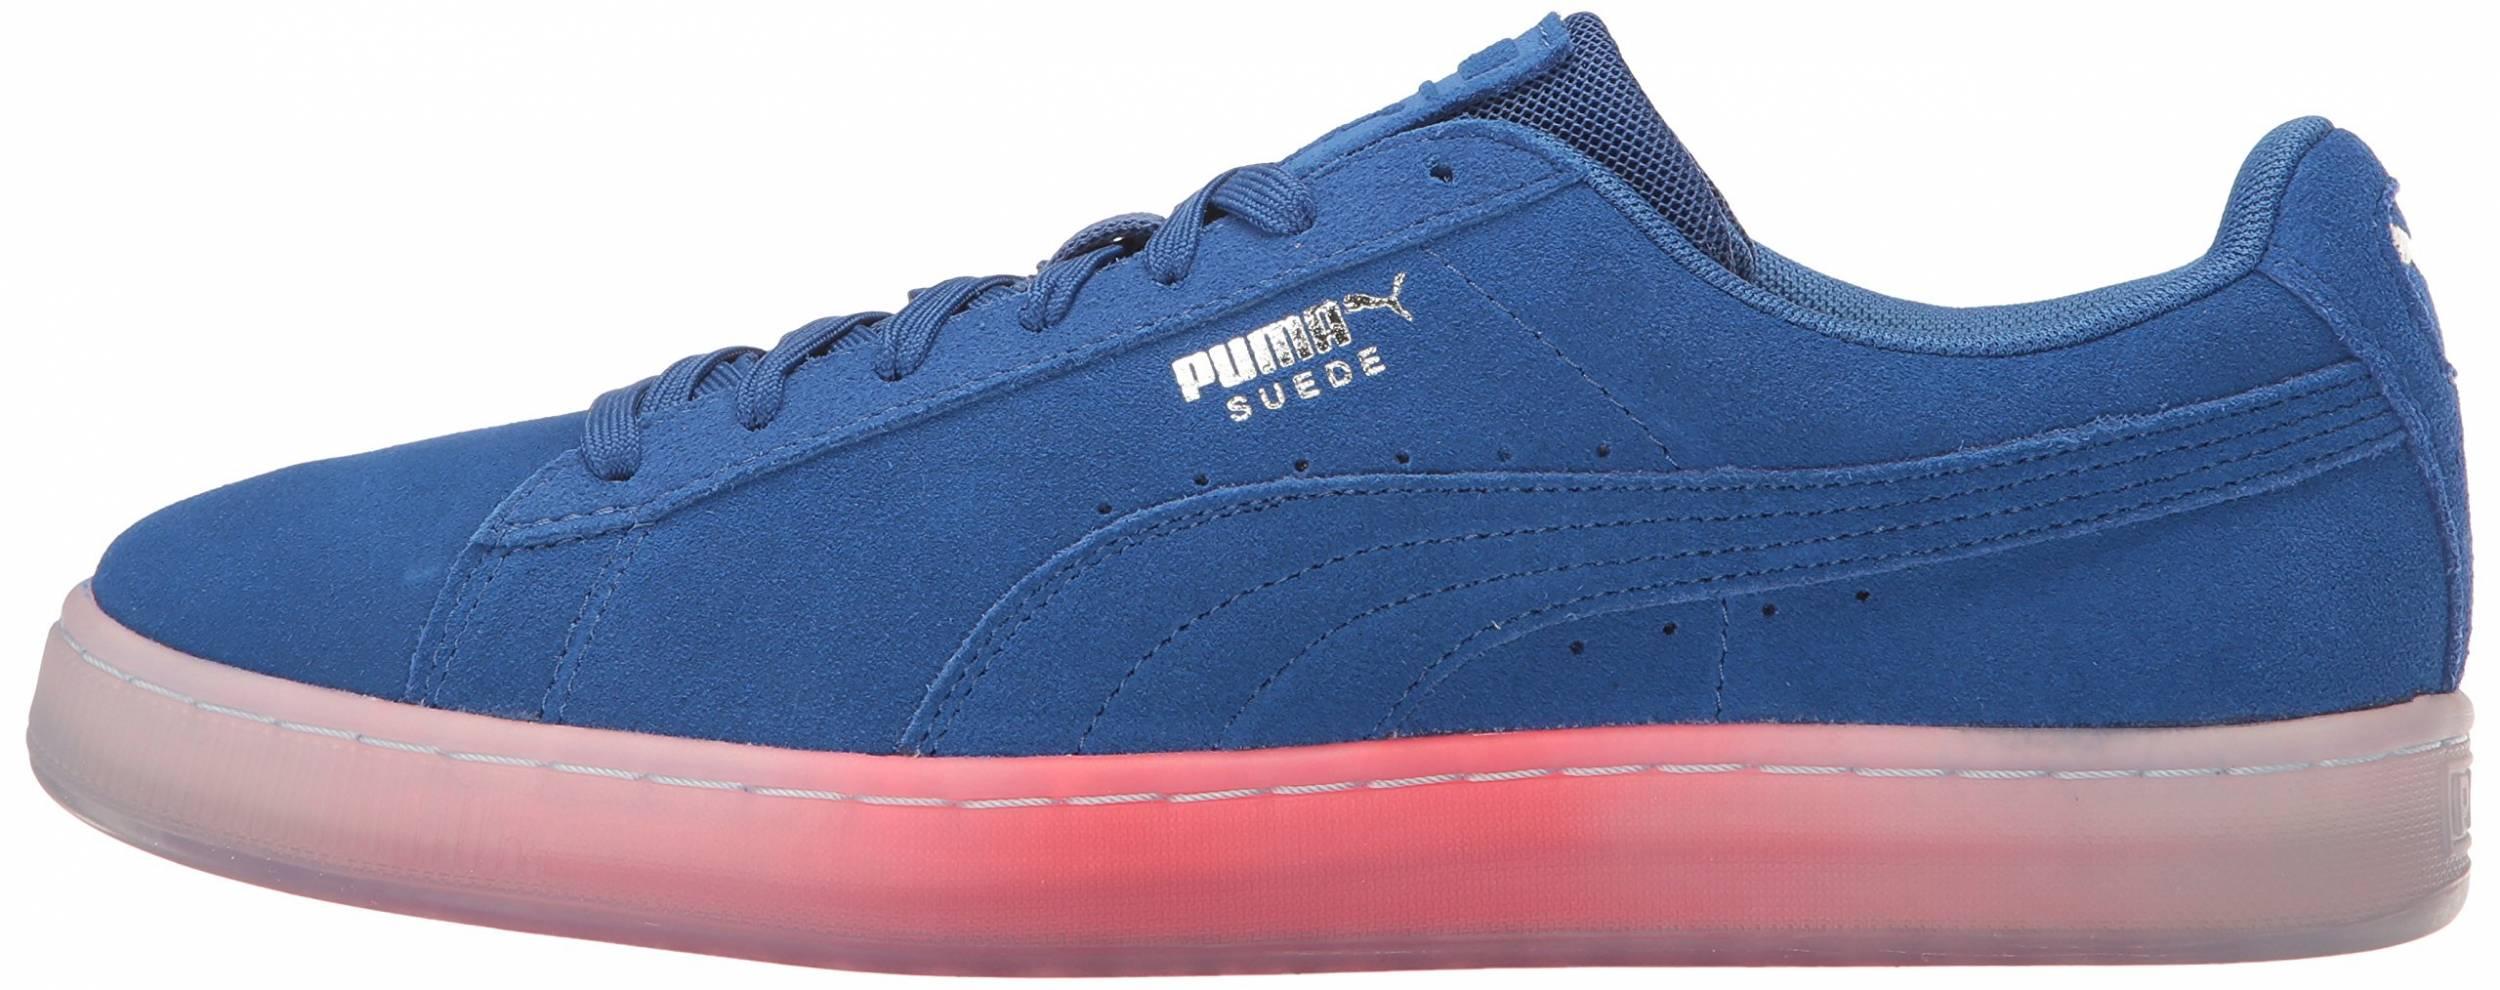 puma 1973 shoes